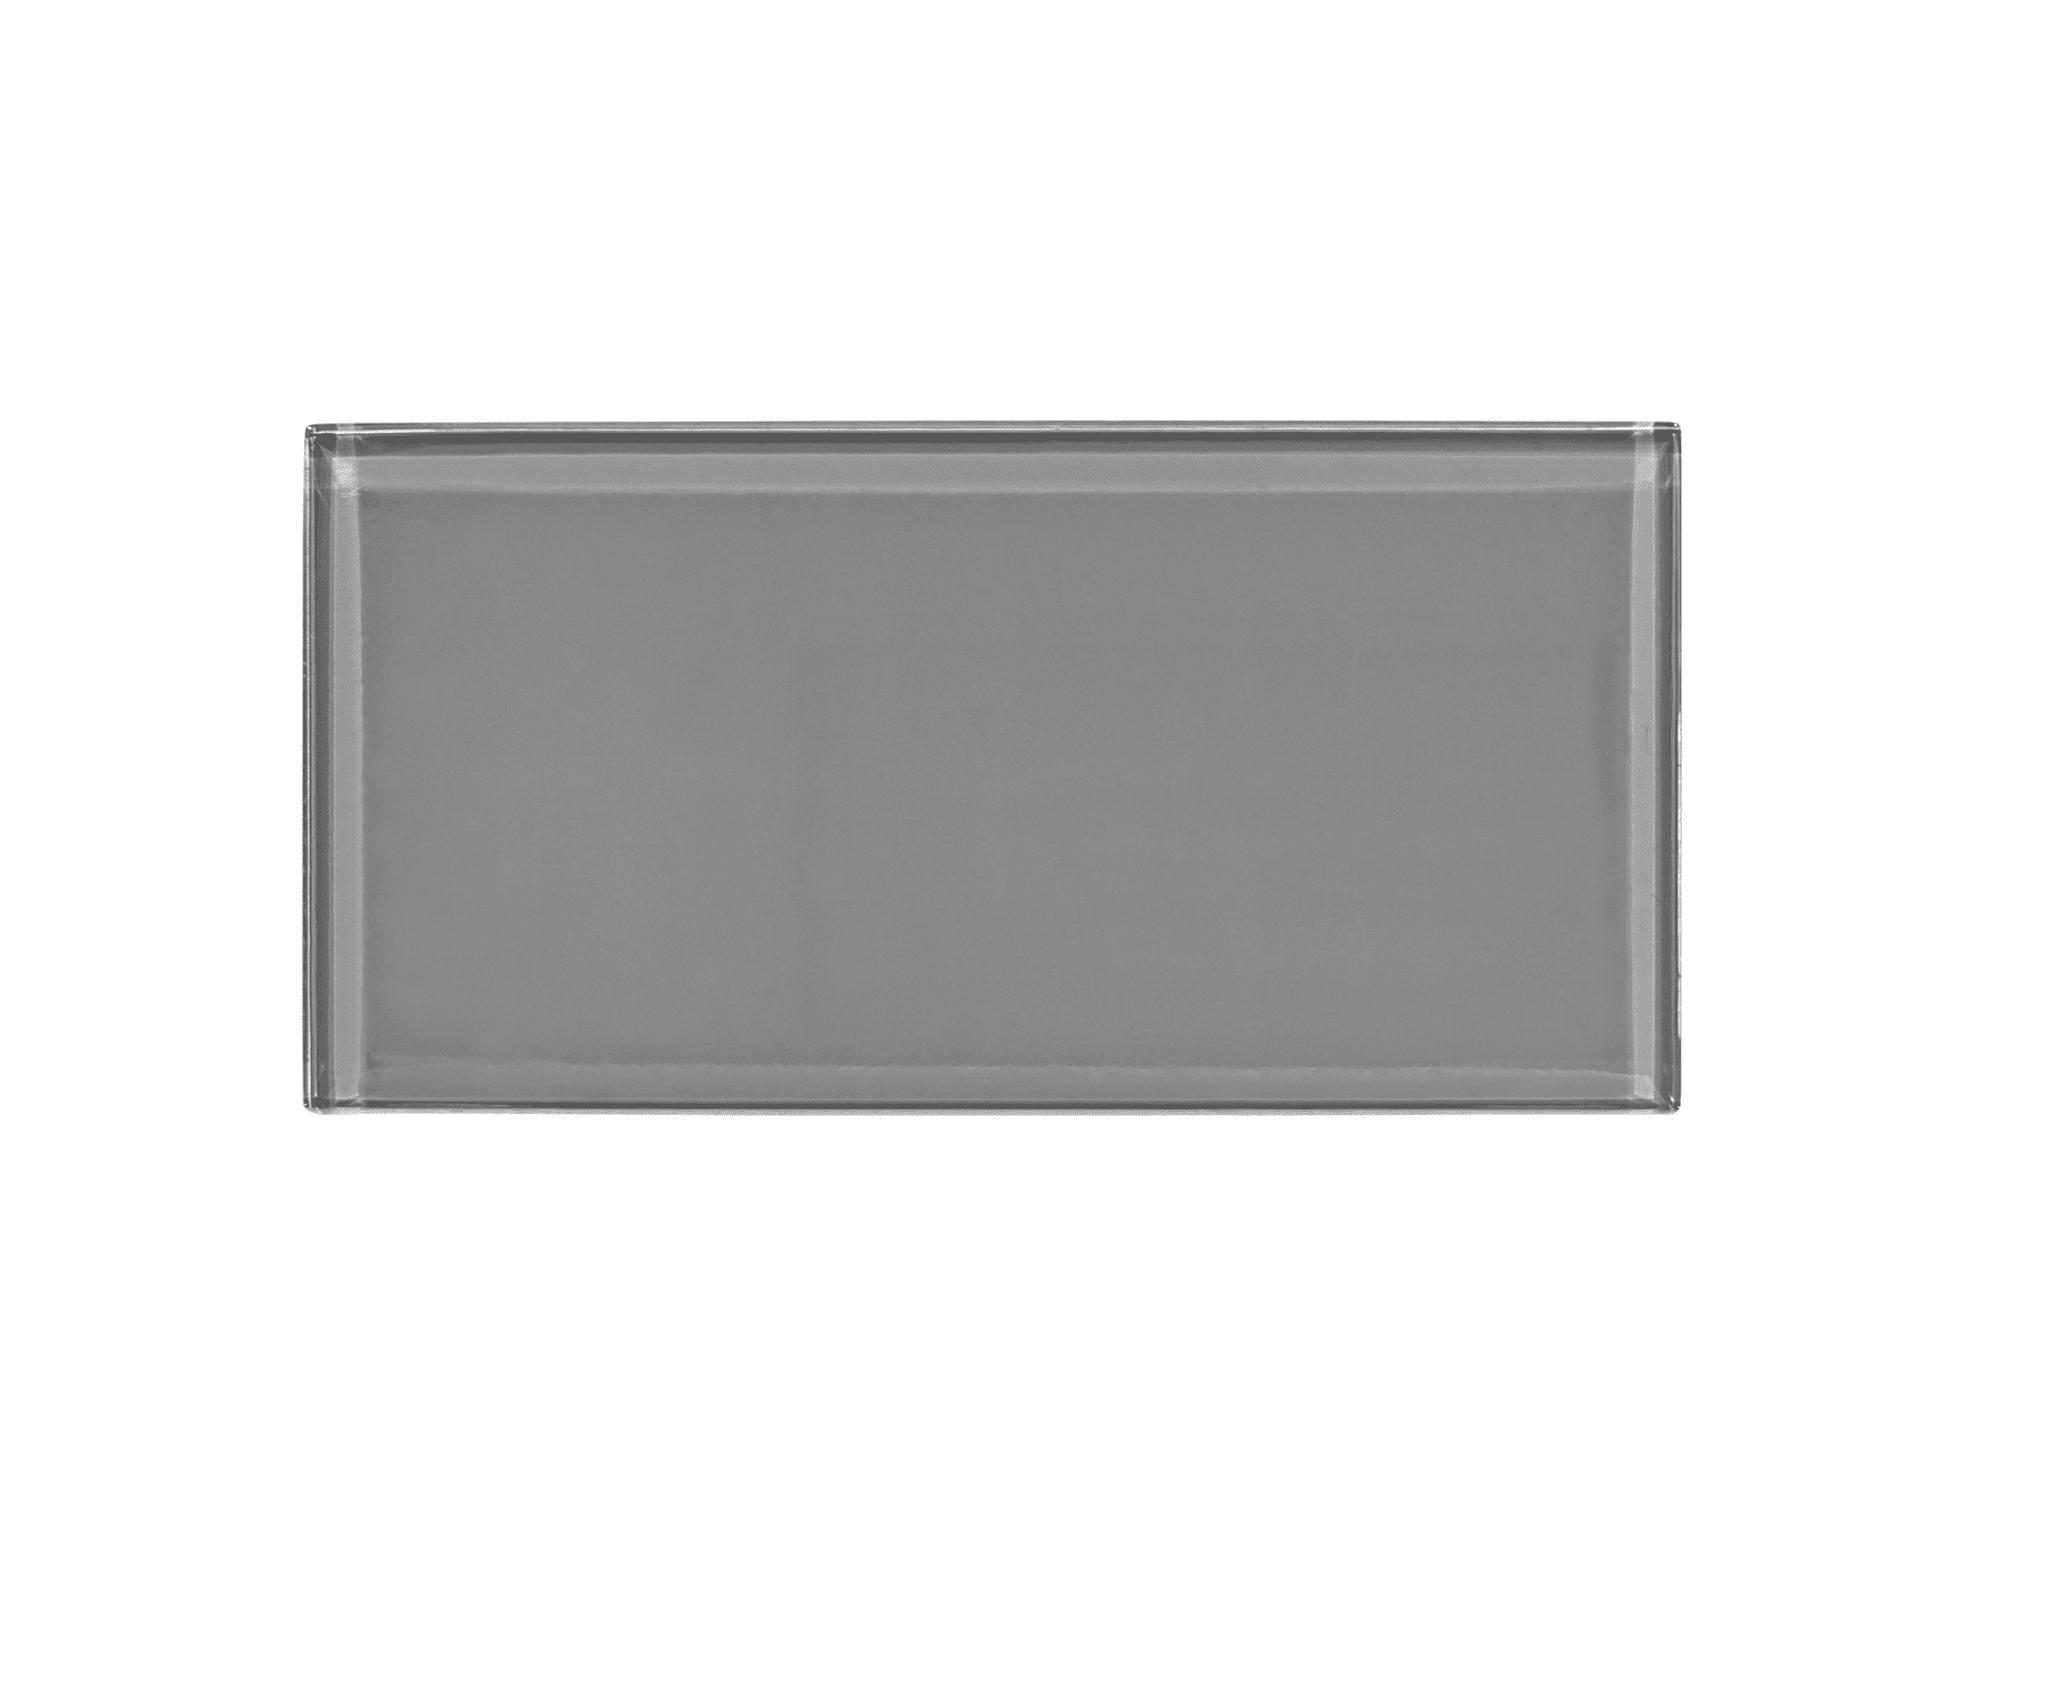 3 X 6 In Gray Glass Tile